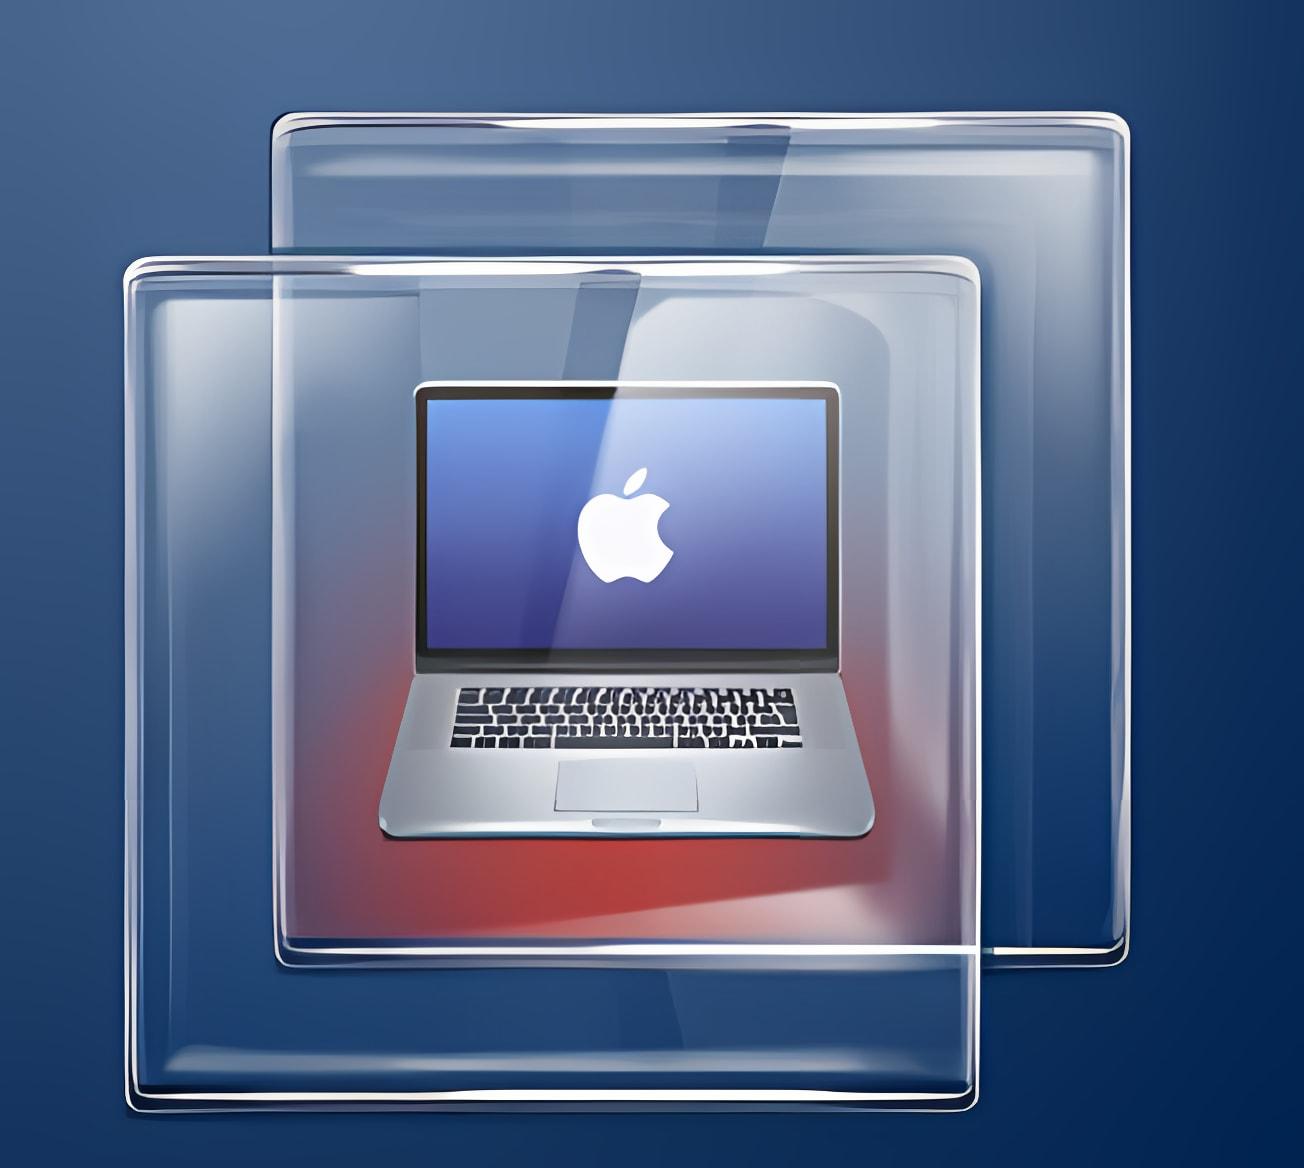 Acronis True Image 2015 for Mac